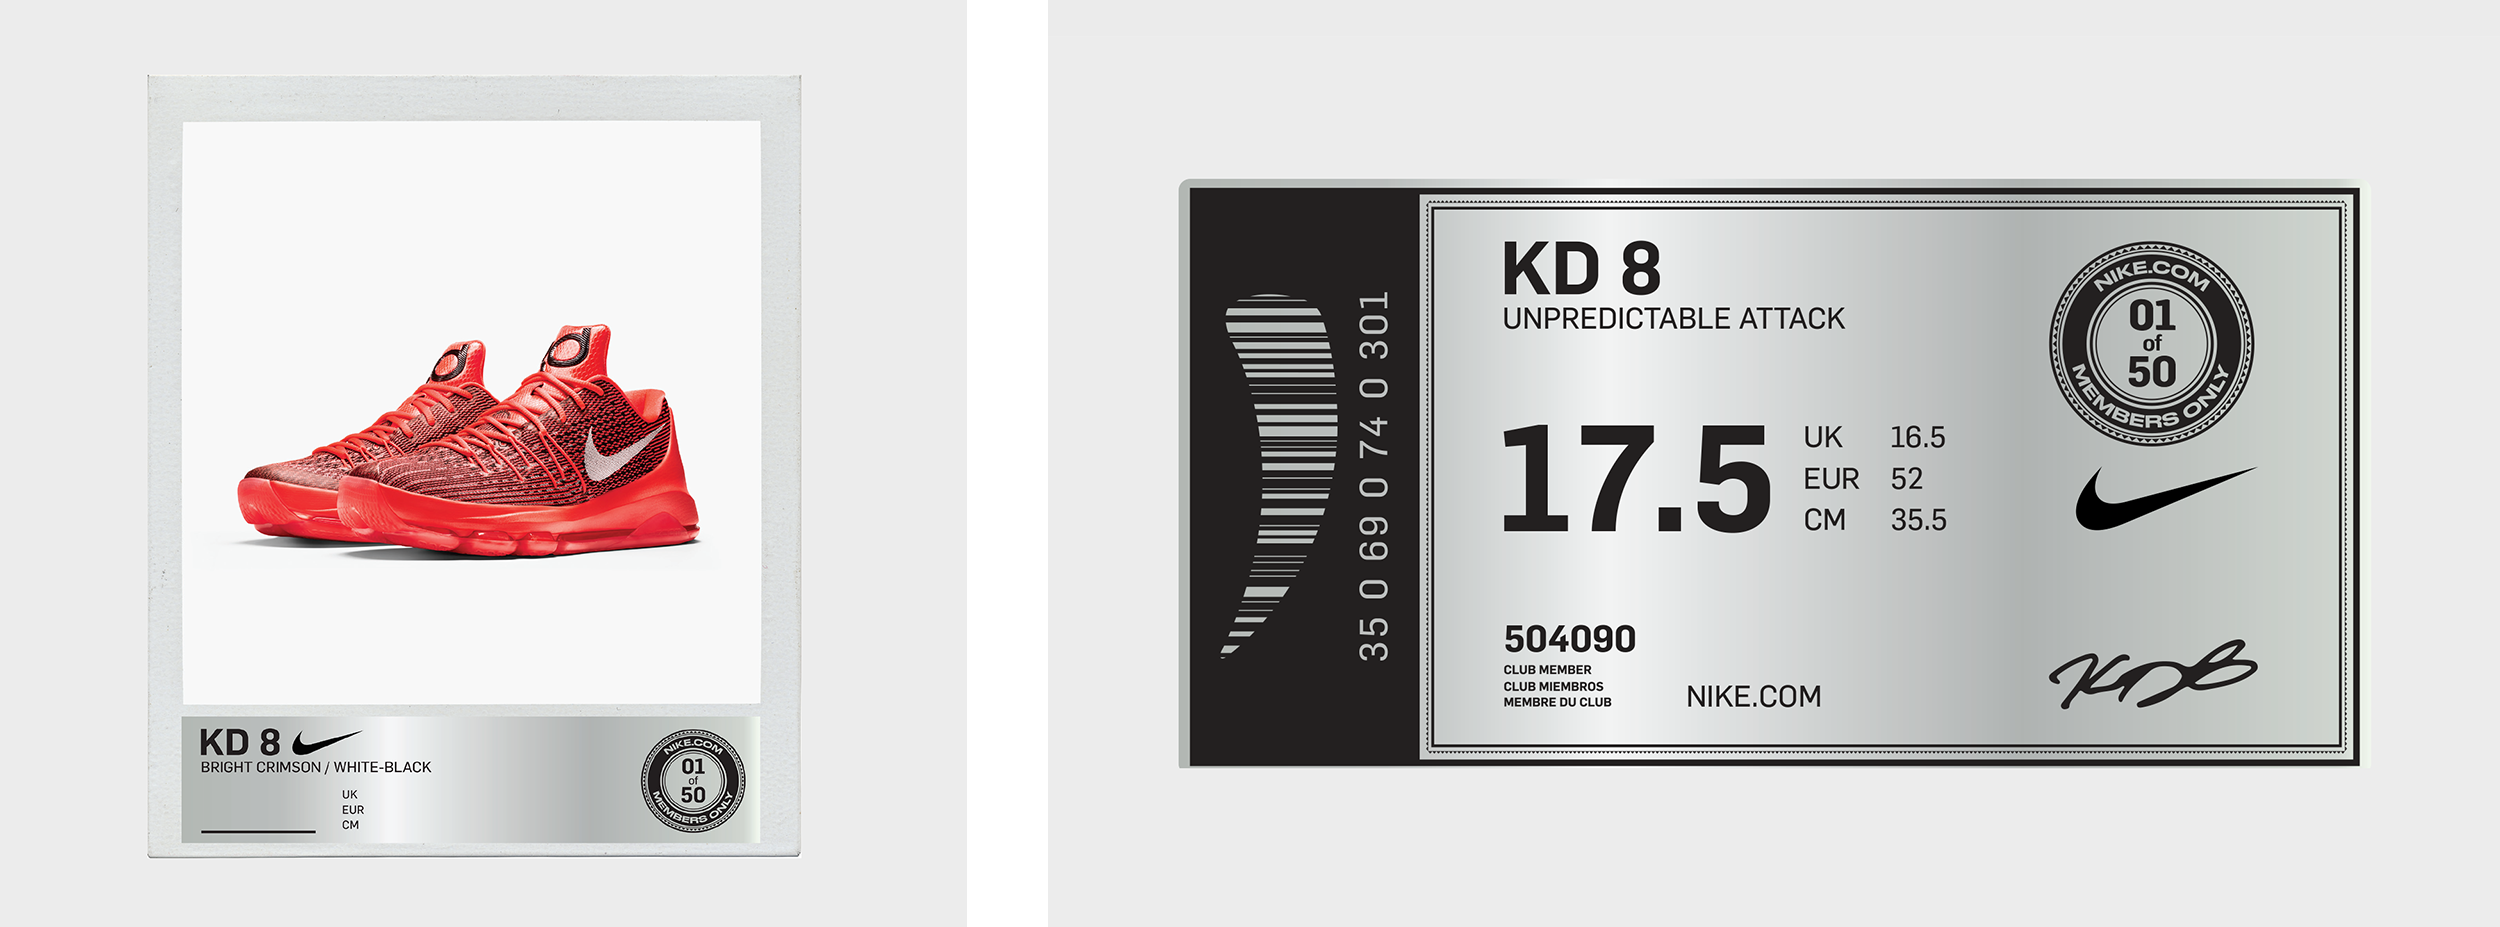 KD8_Elements2.png